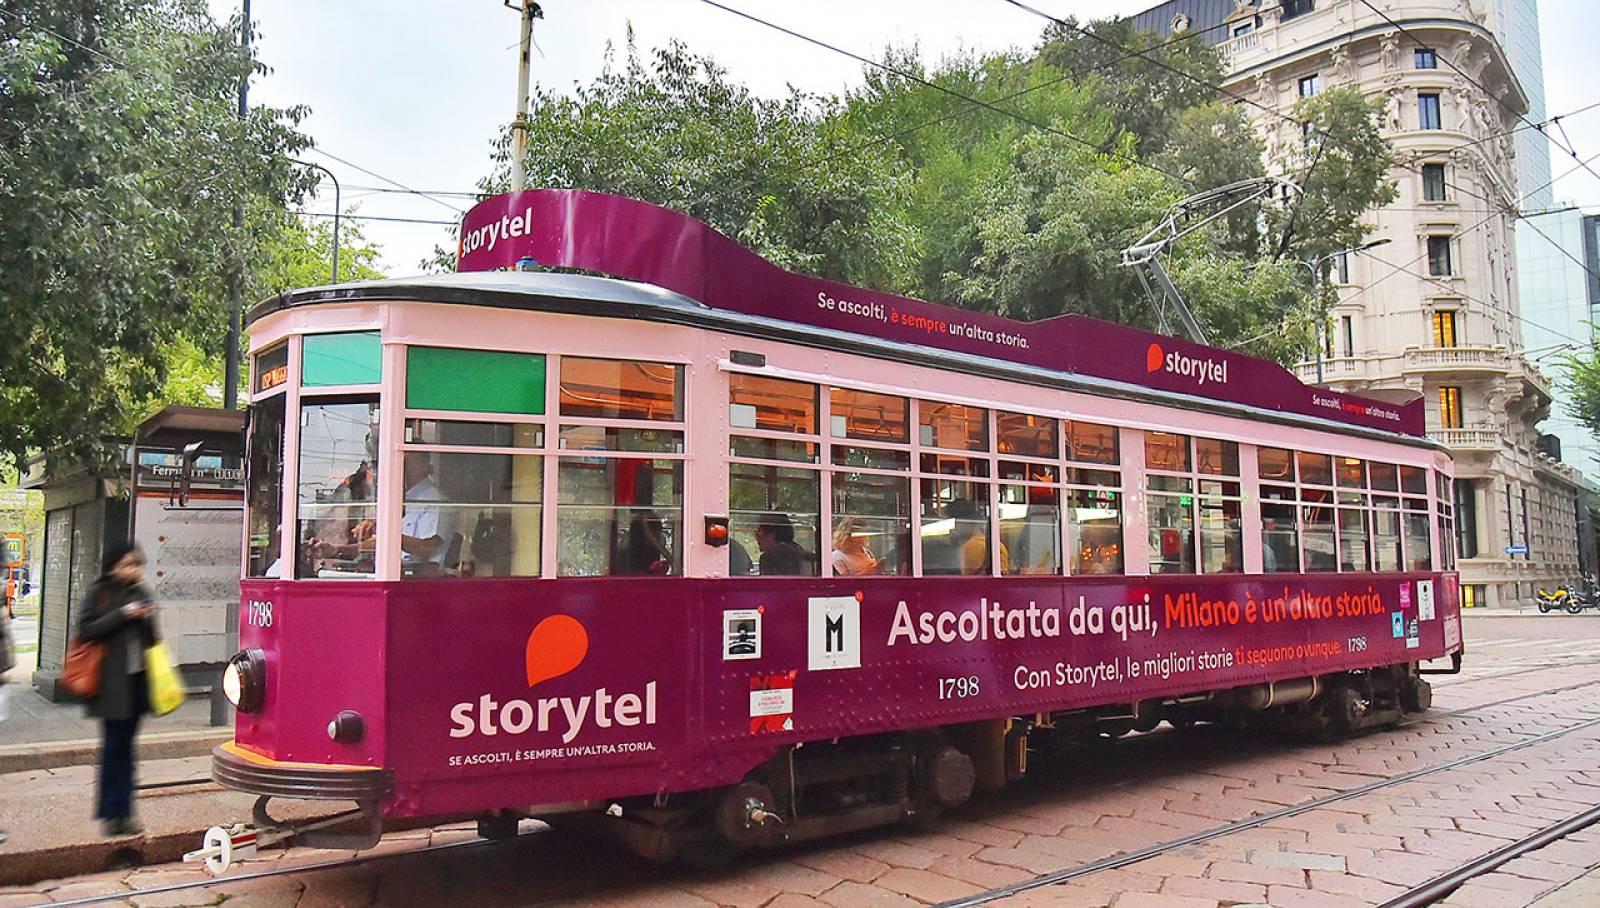 Pubblicità sui tram IGPDecaux Full-Wrap a Milano per Storytel